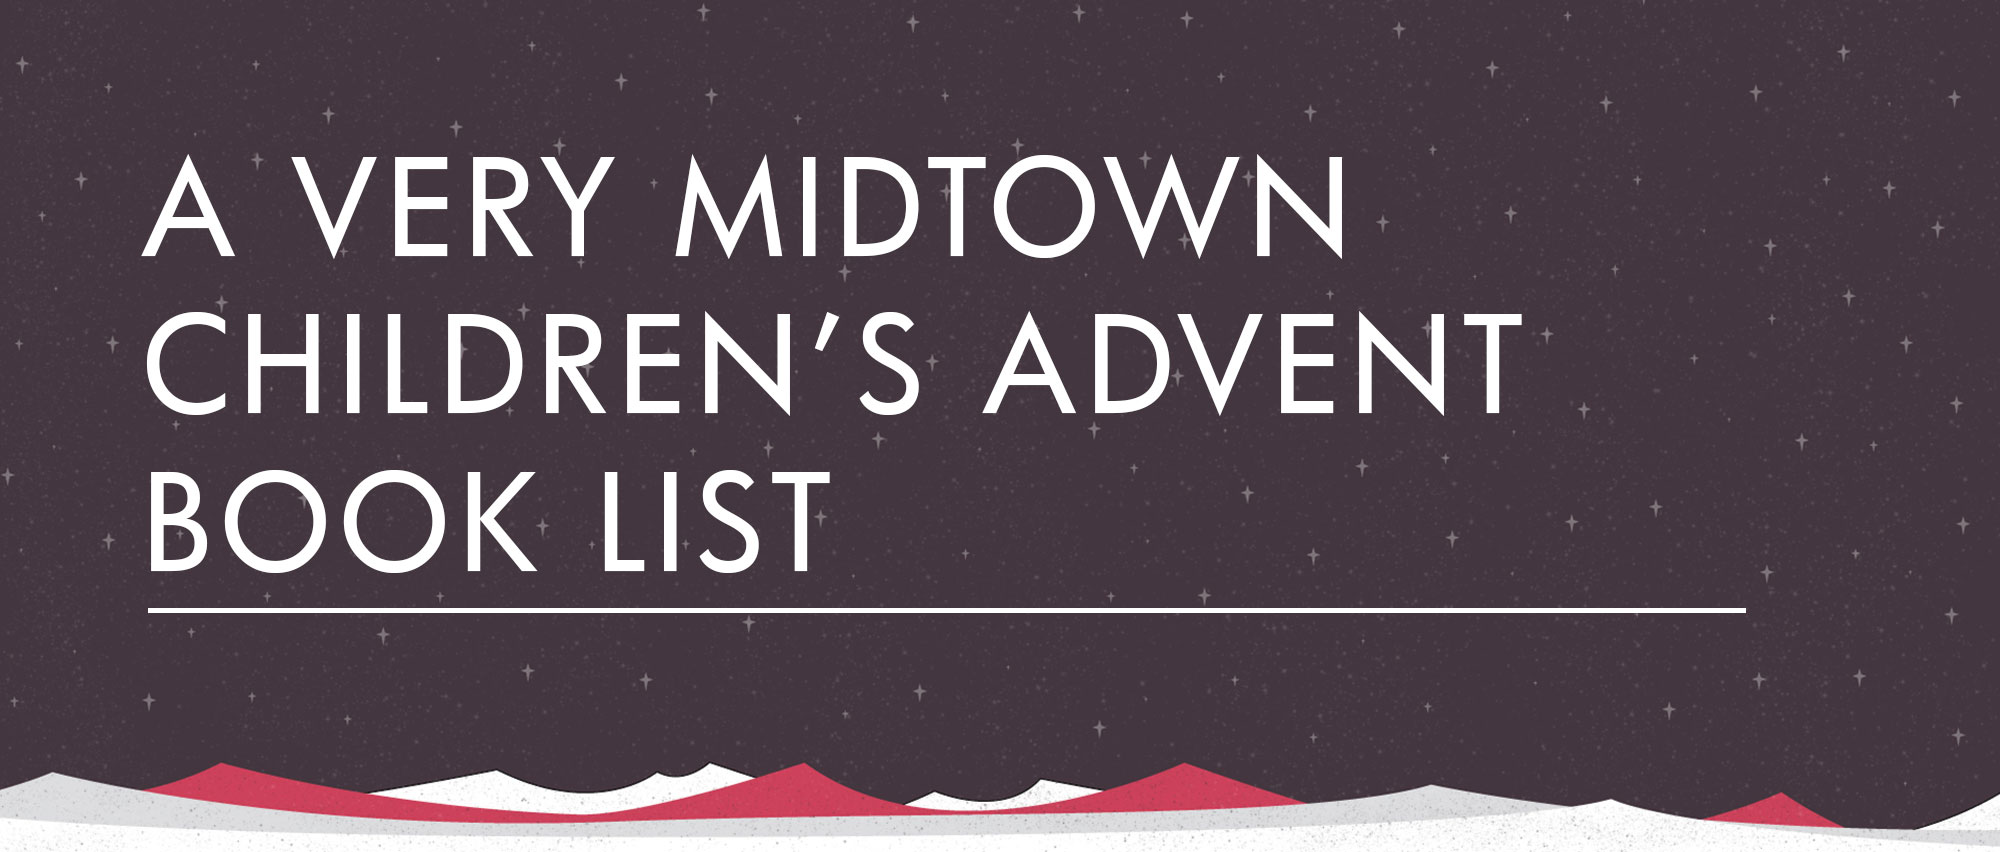 Giv_BlogHeader_A-Very-Midtown-Childrens-Advent--Book-List.jpg